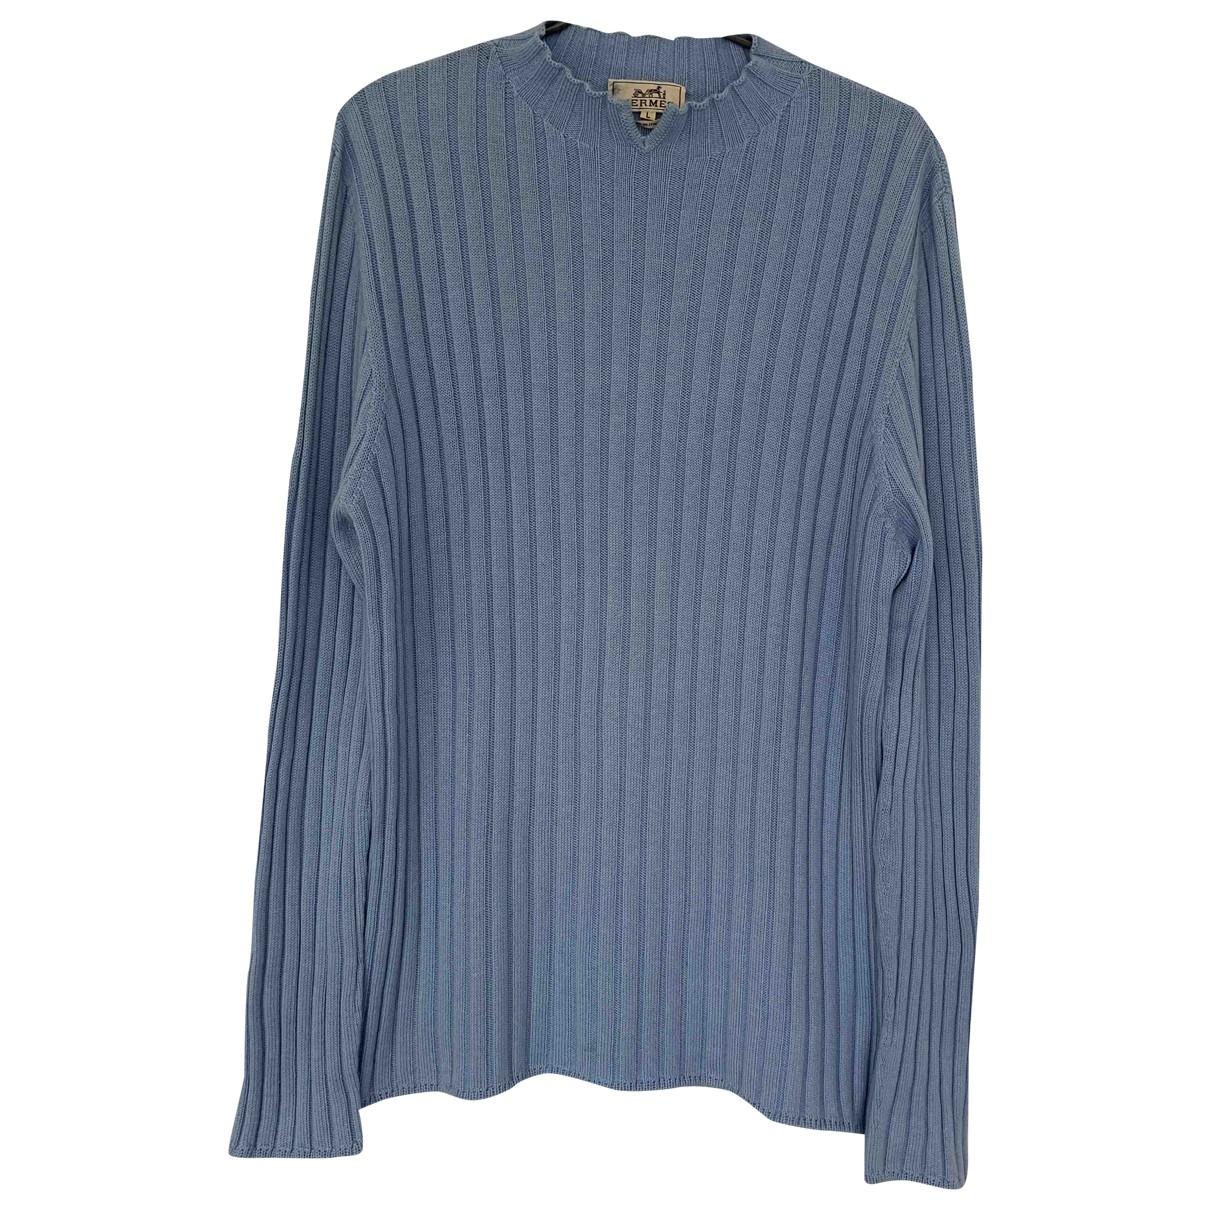 Hermès \N Blue Cashmere Knitwear & Sweatshirts for Men L International